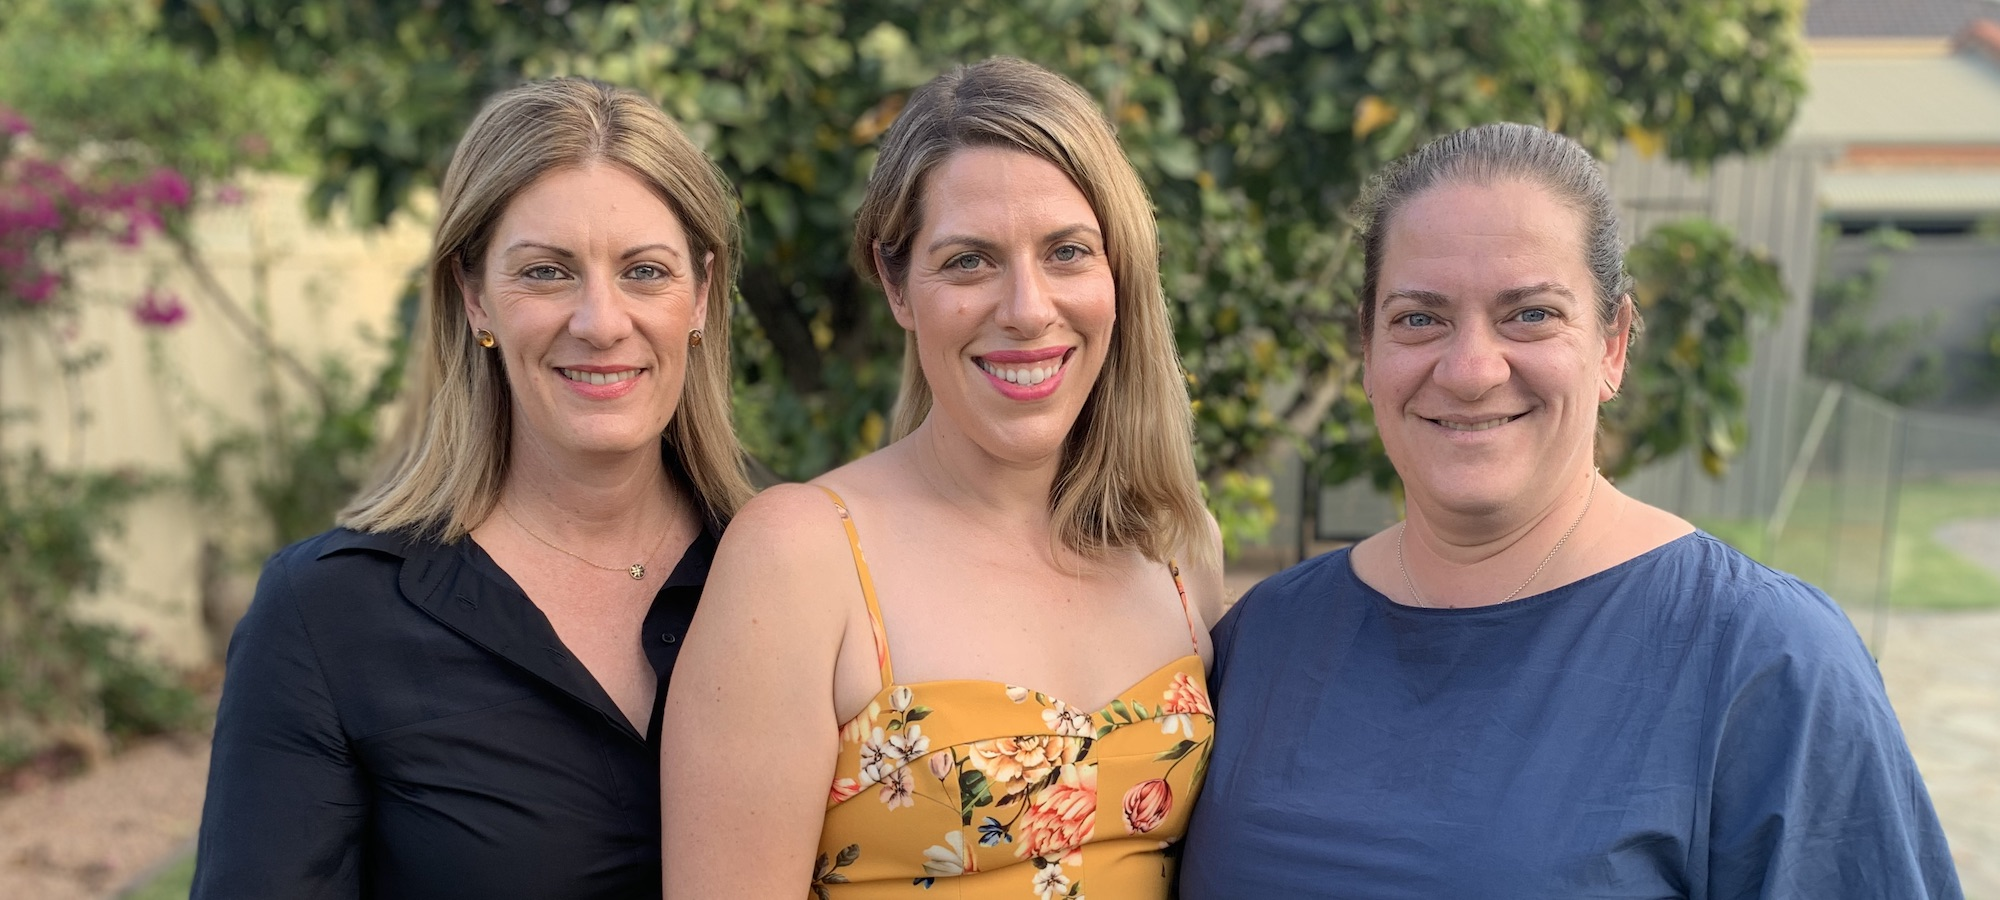 Miranda Sisters Produce An Ideal Winery Blend photo